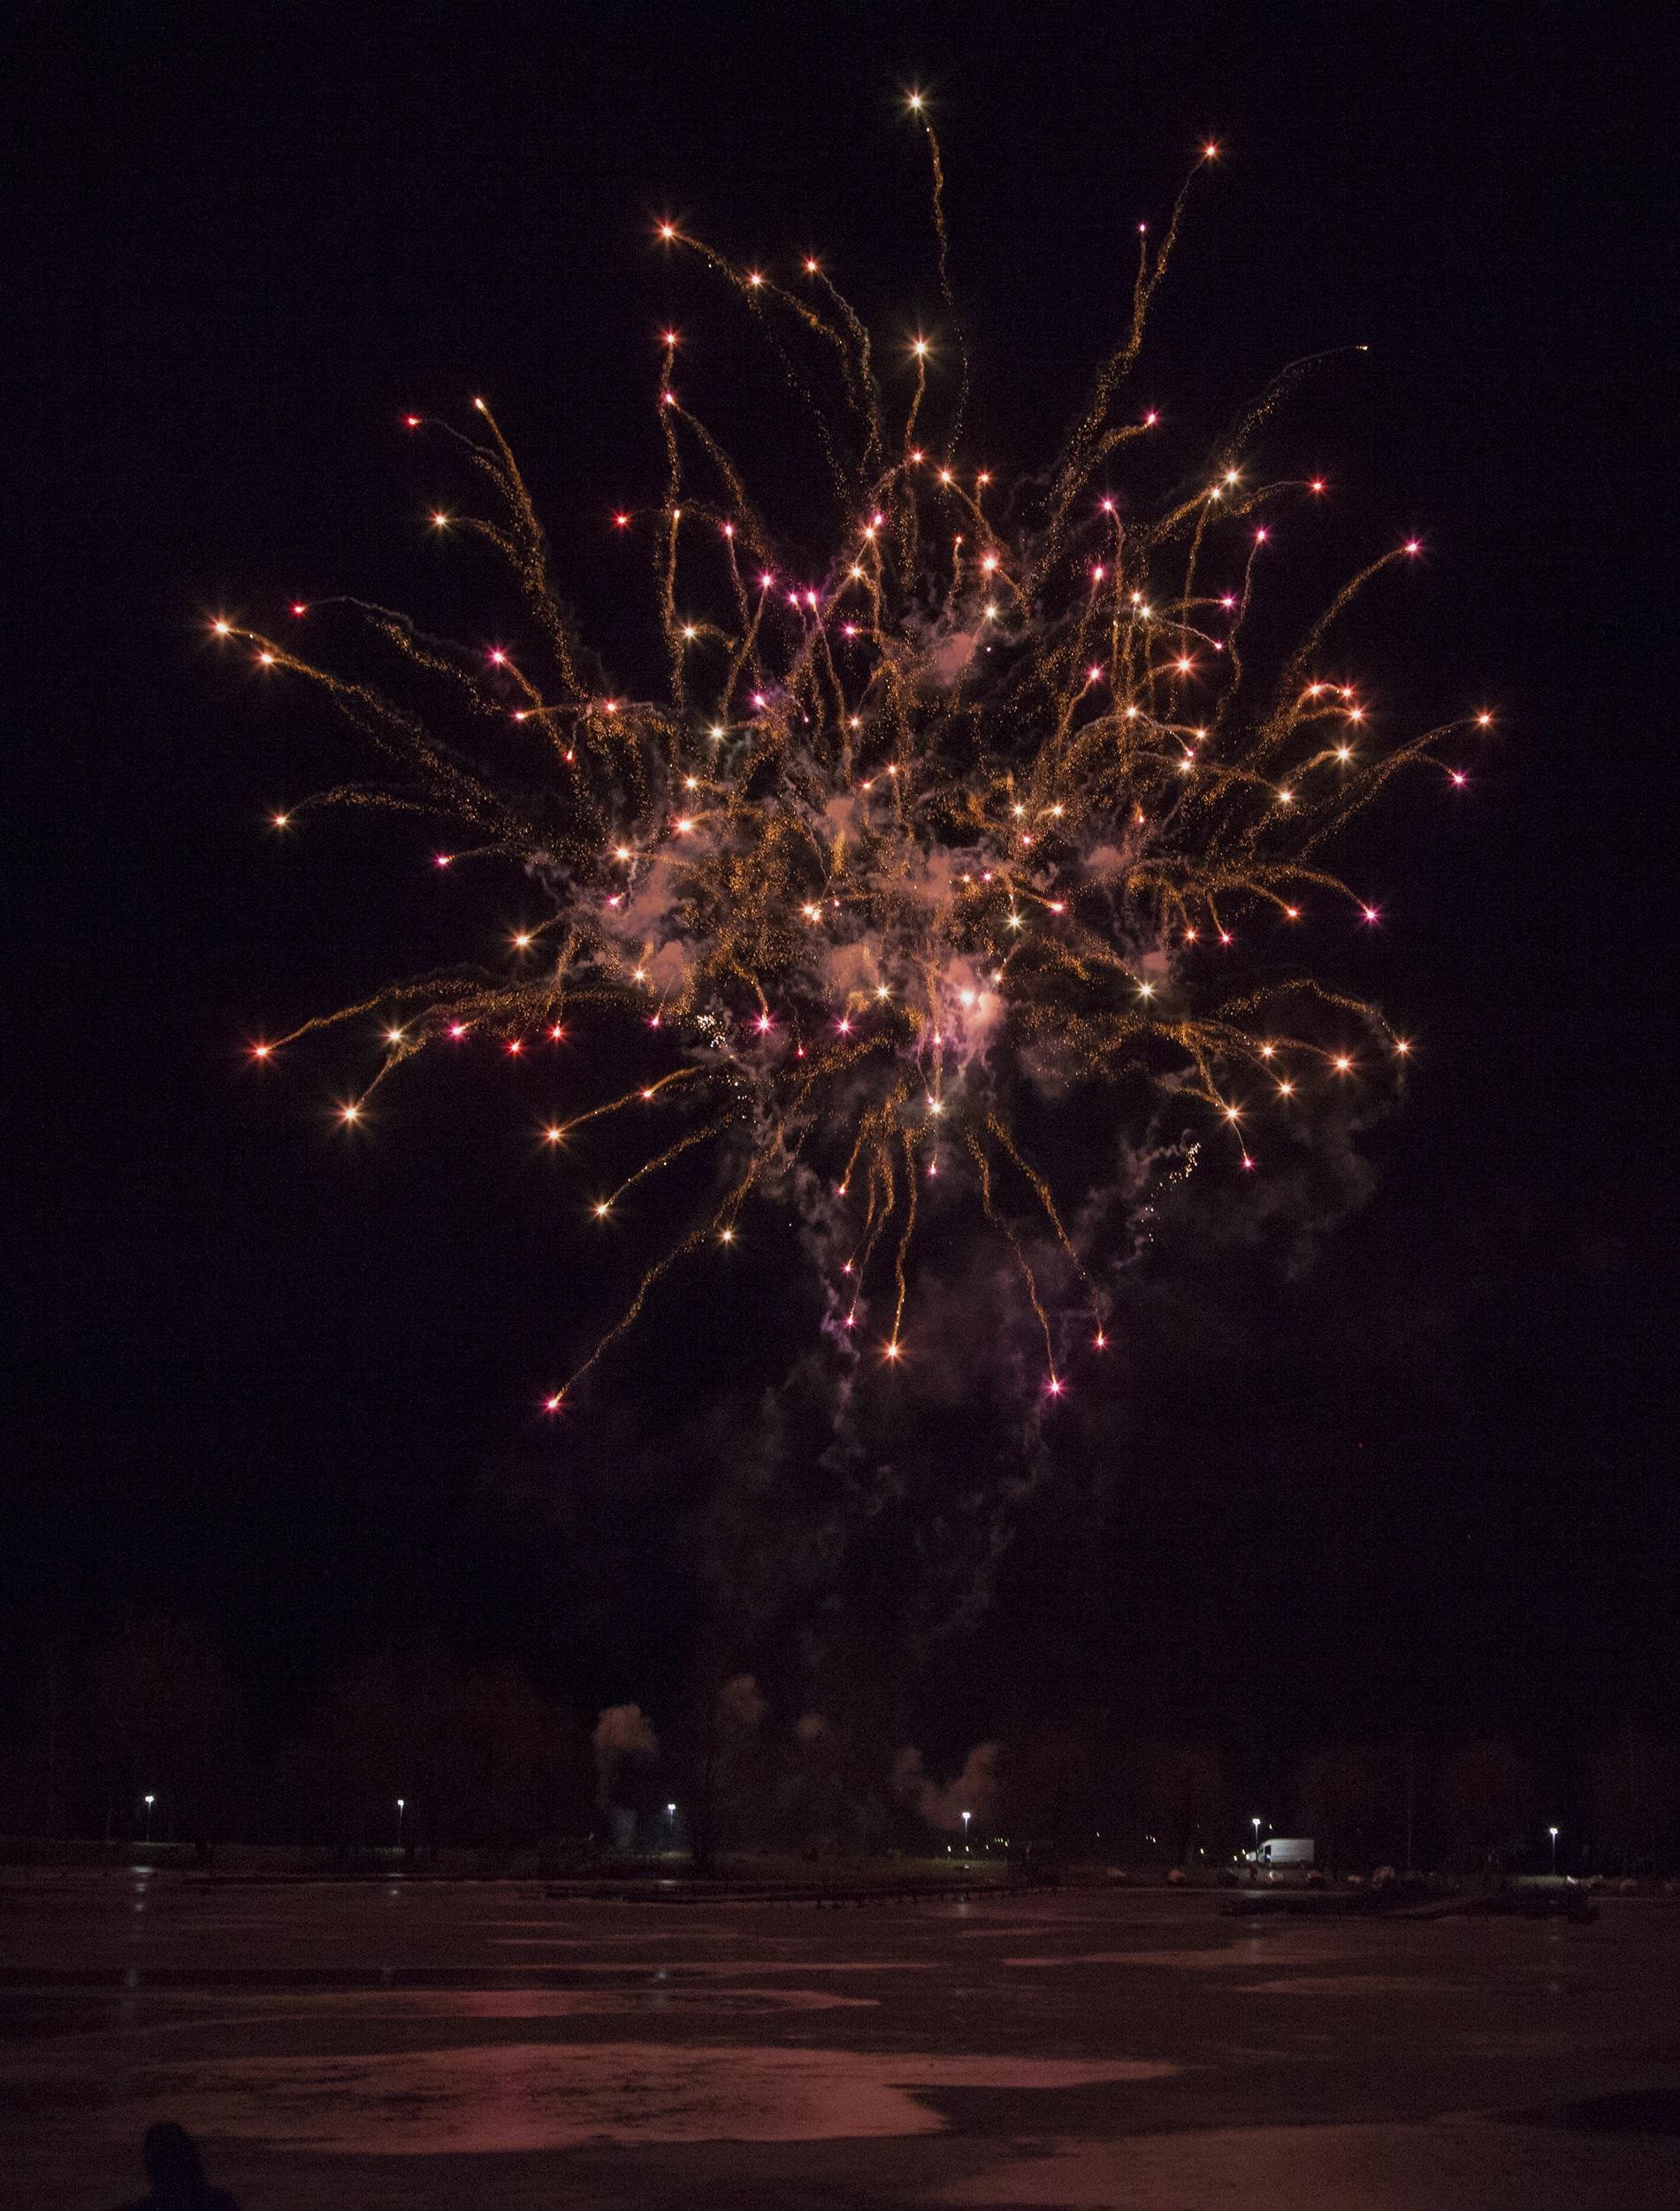 Gambar langit rekreasi kilau merah kegelapan tahun baru gambar langit rekreasi kilau merah kegelapan tahun baru festival kembang api pesta peristiwa tengah malam malam tahun baru selamat tahun baru voltagebd Images